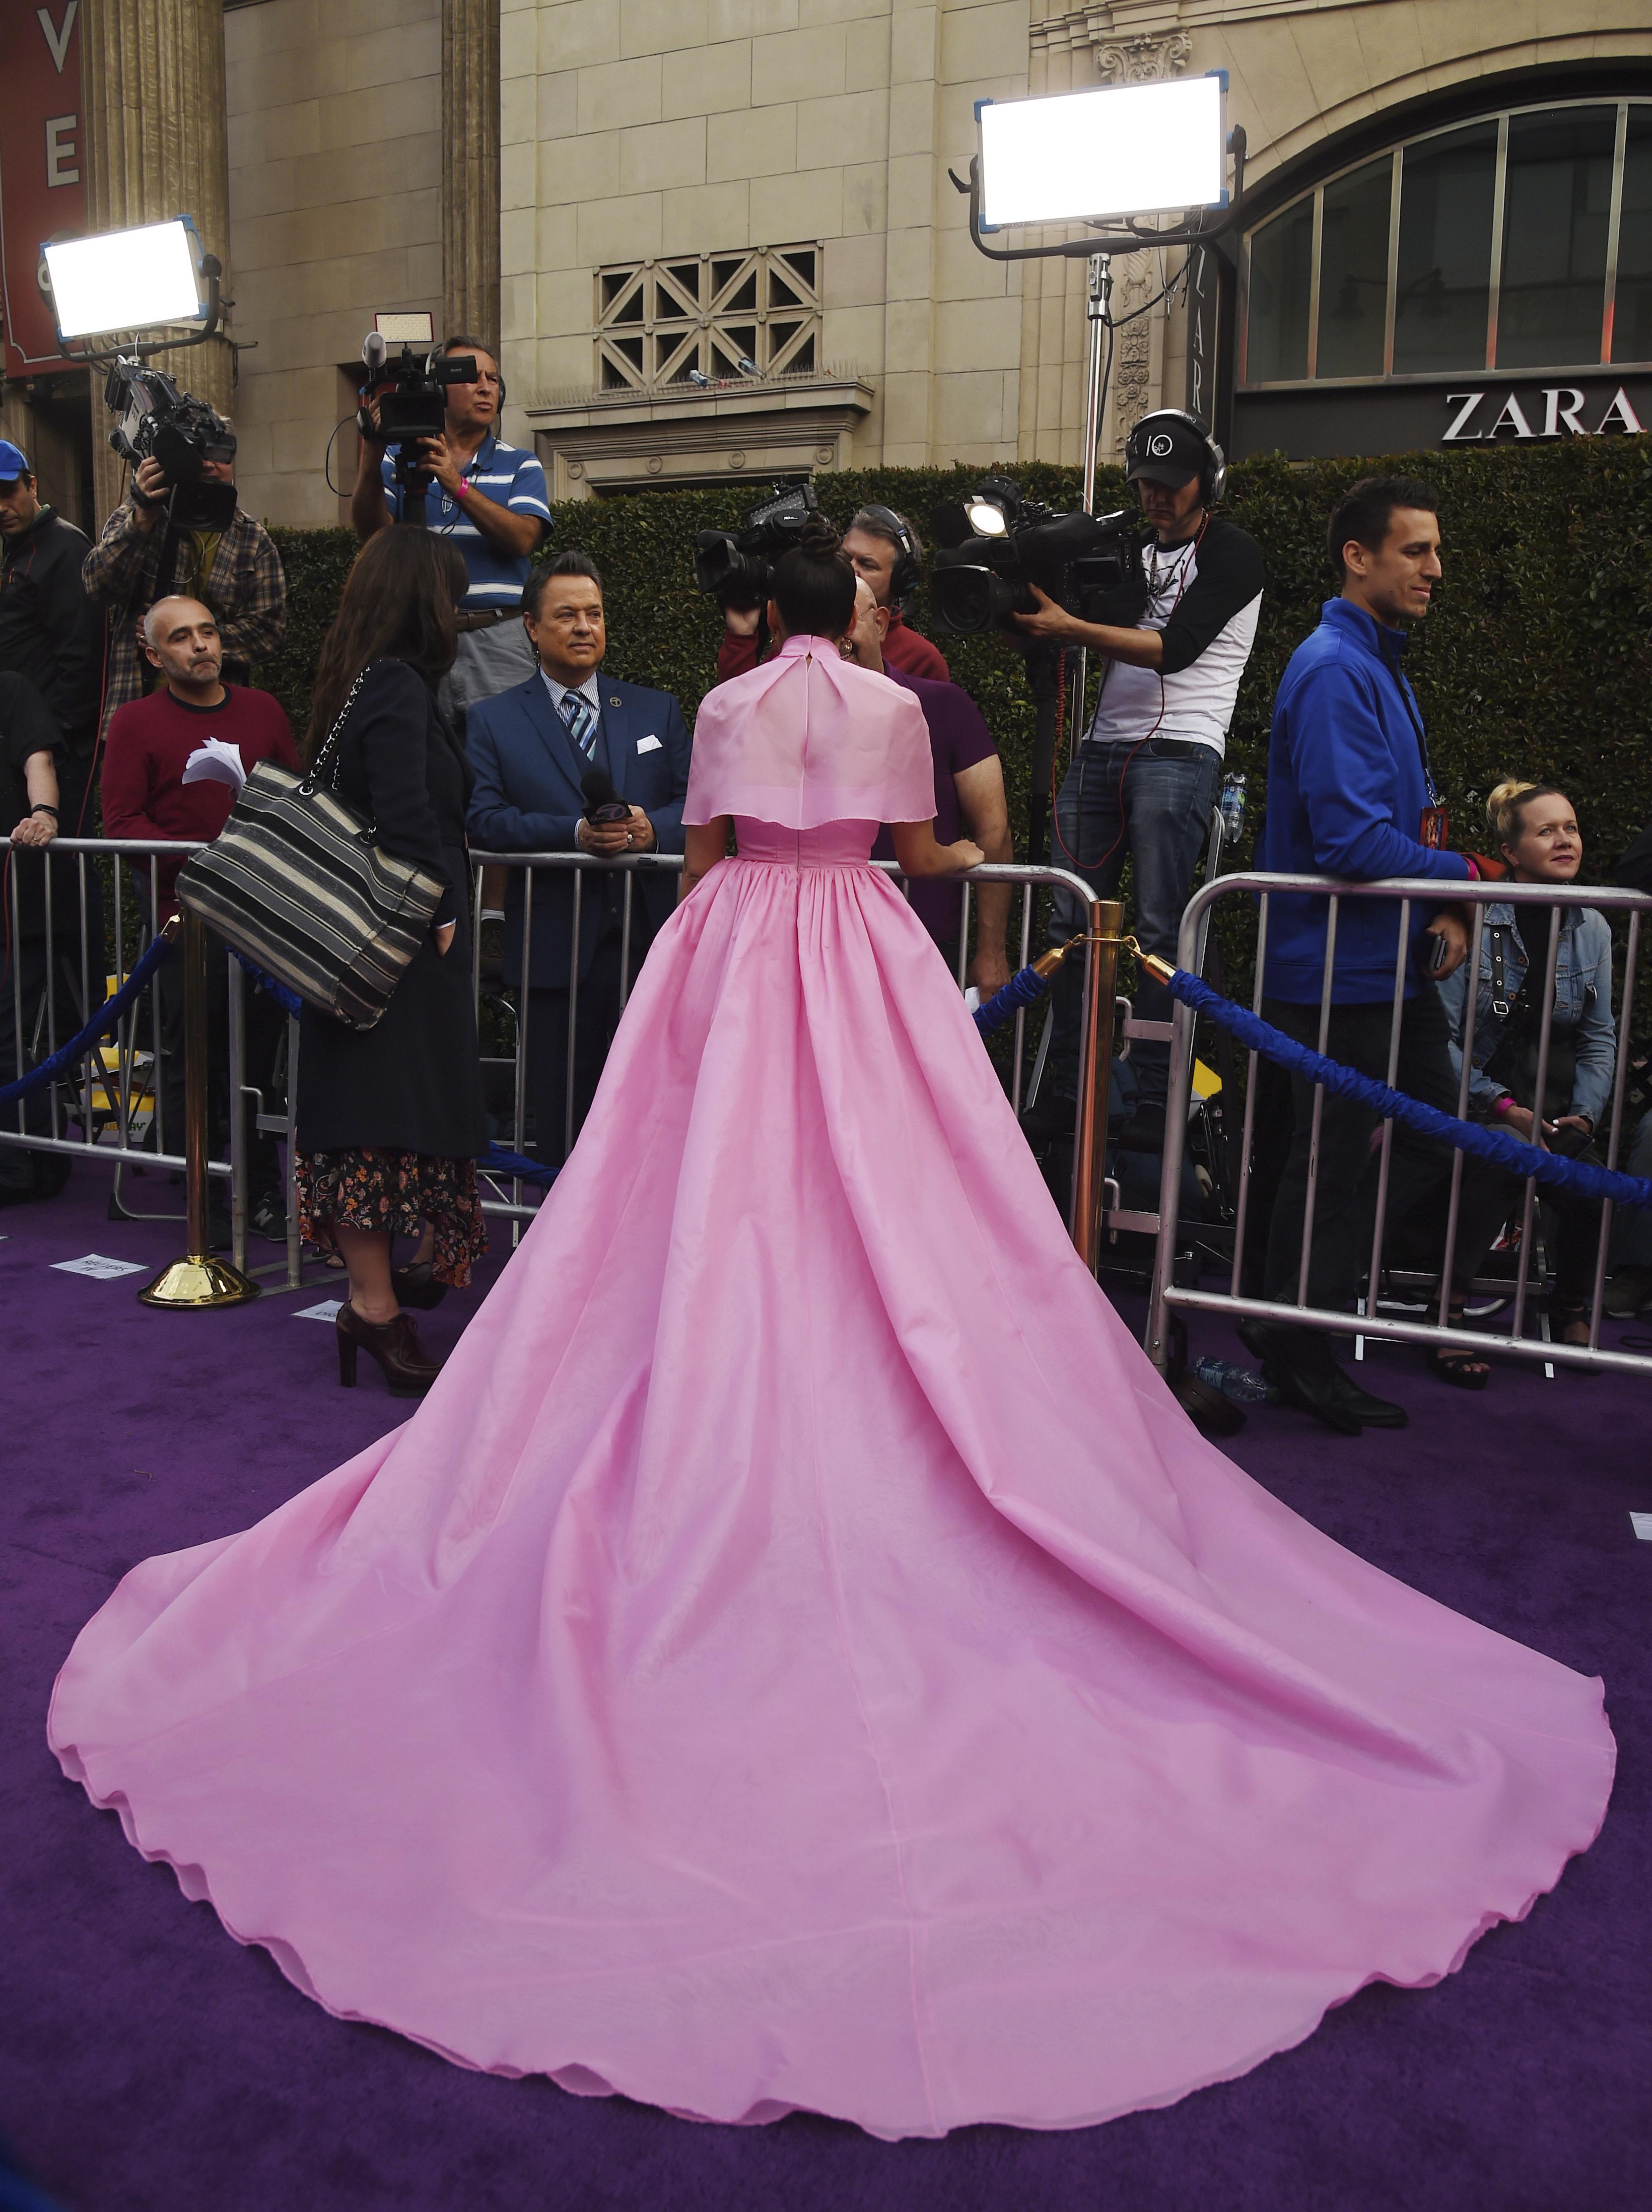 Naomi Scott en el photocall de 'Aladdín' con un espectacular vestido maxi falda digno de princesa de Disney y moño de bailarina. (Photo by Chris Pizzello/Invision/AP)